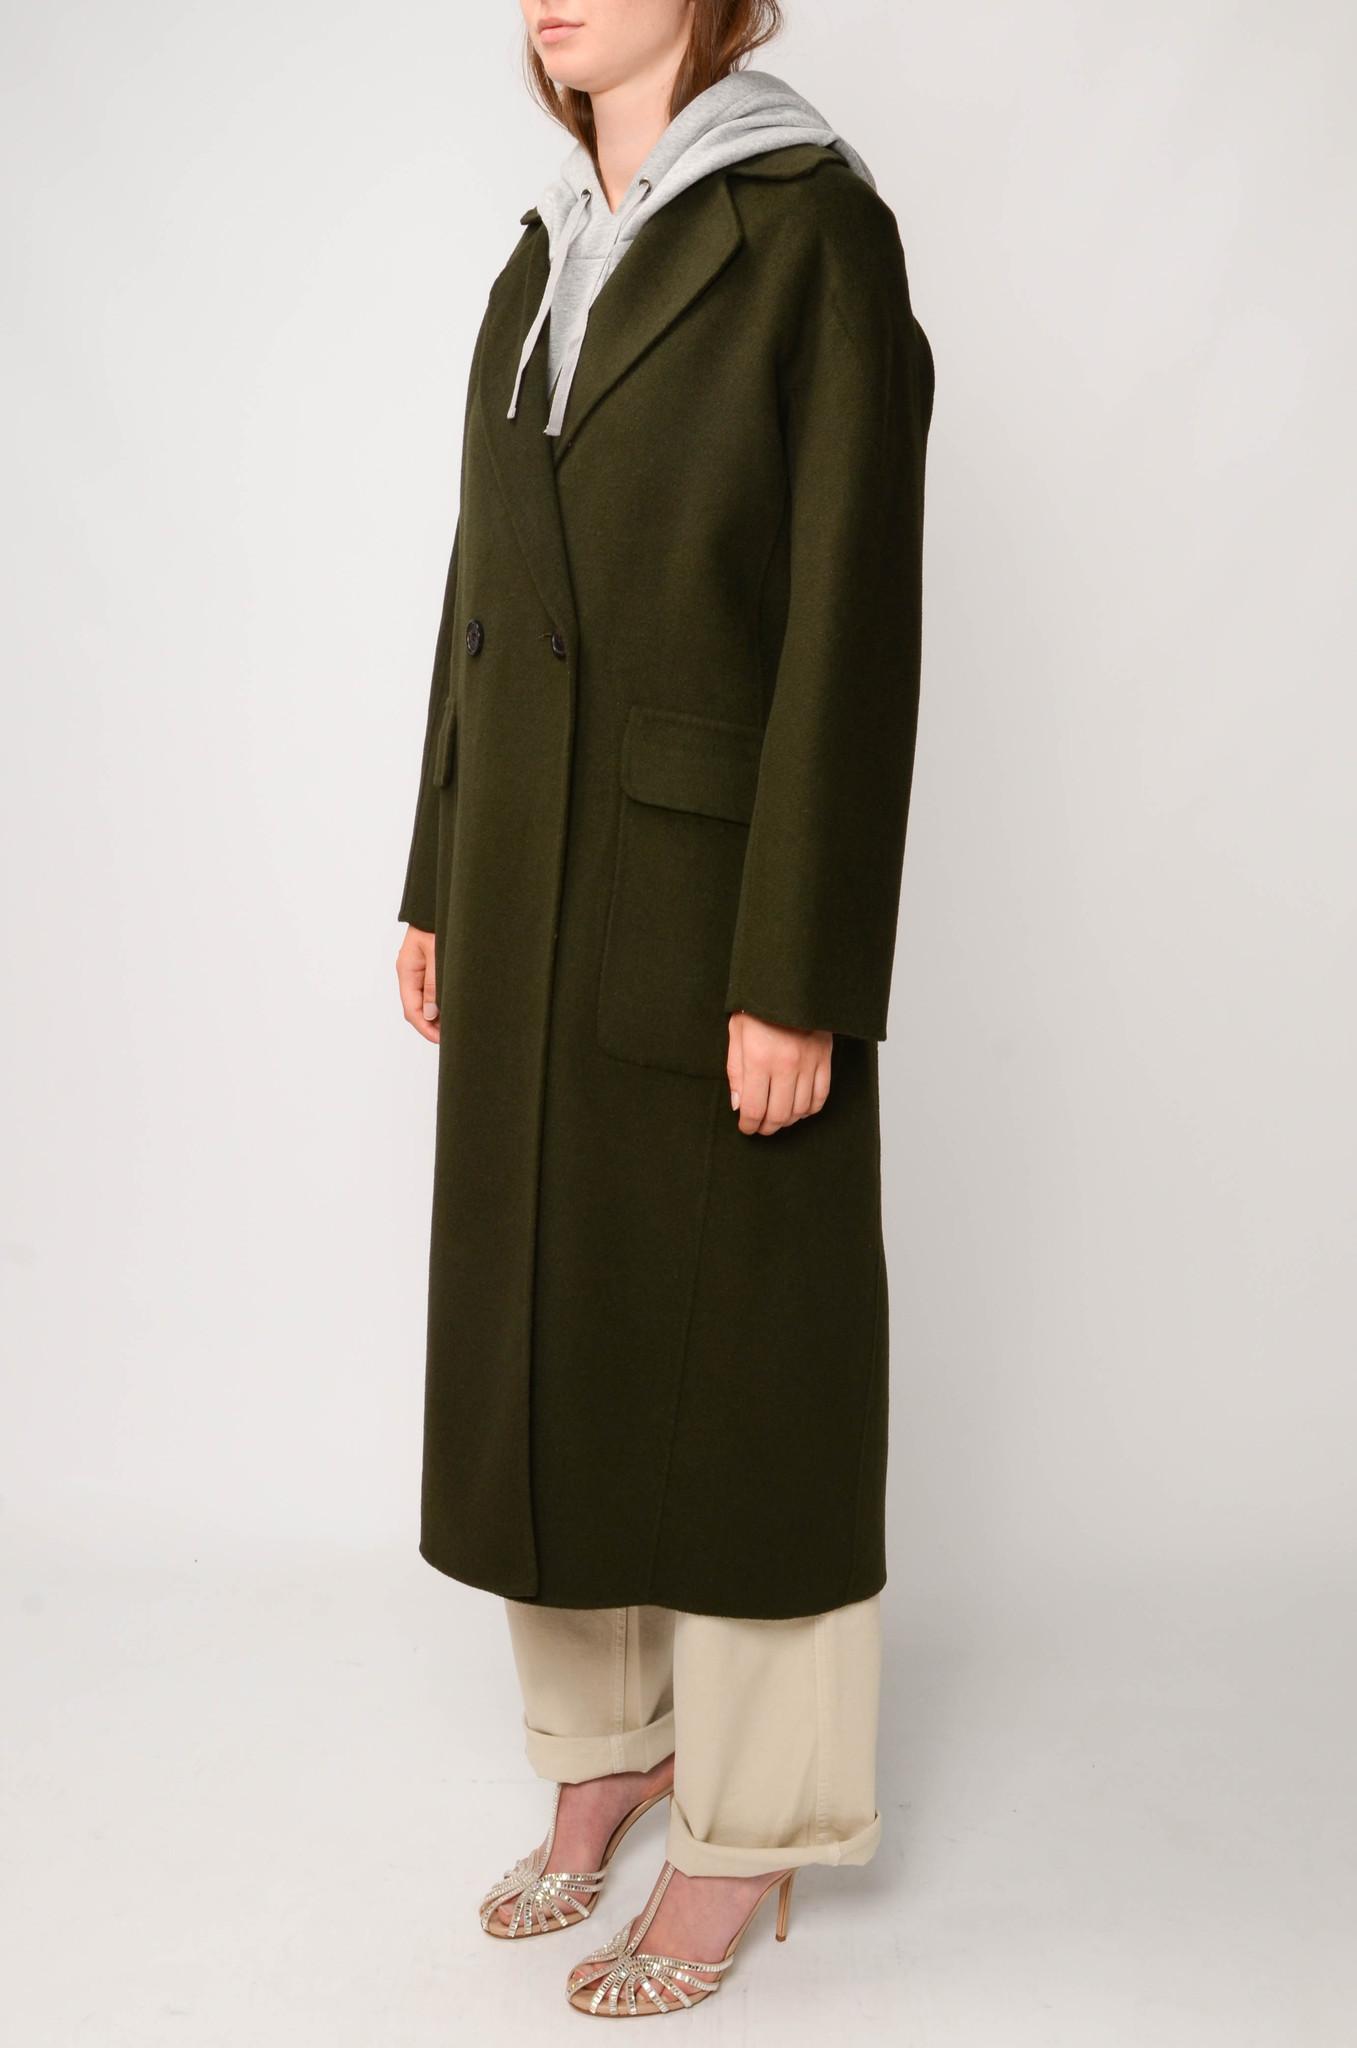 LONG COAT IN DARK GREEN-3